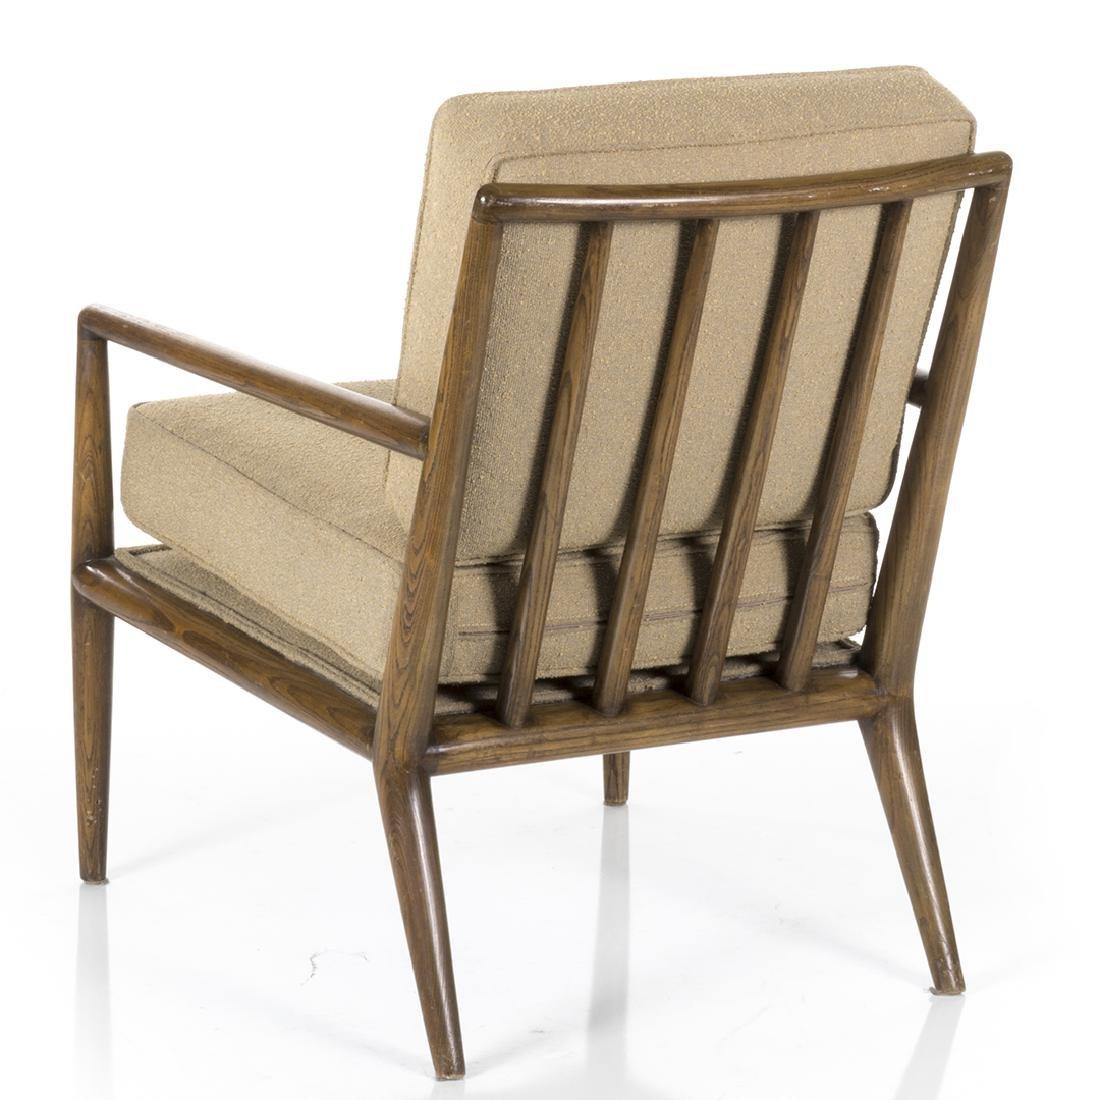 T.H. Robsjohn Gibbings Style Lounge Chair - 2